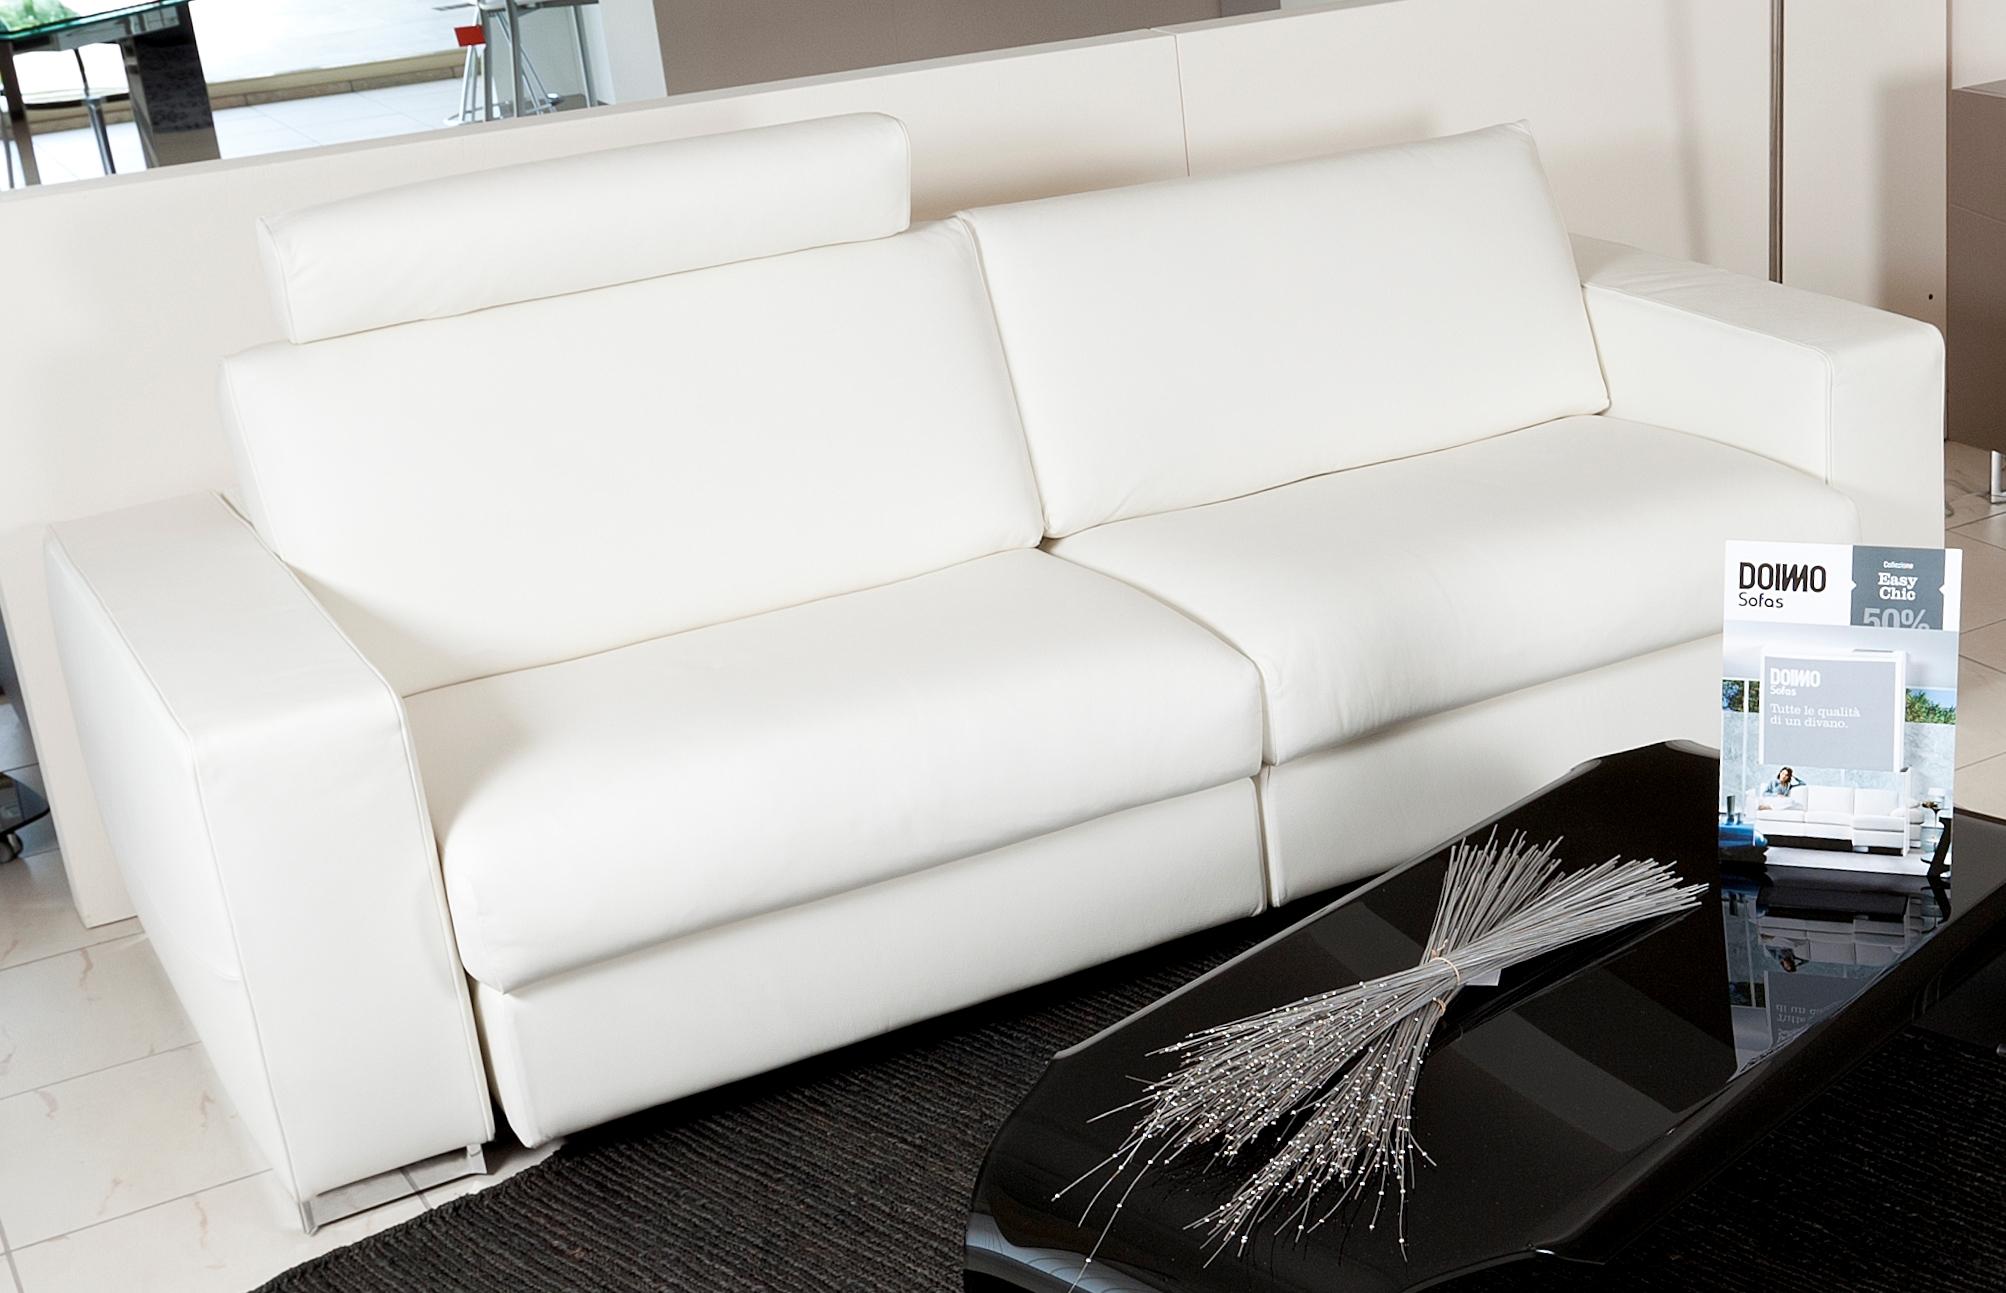 Divano doimo sofas offerta 14417 divani a prezzi scontati - Doimo sofas prezzi ...